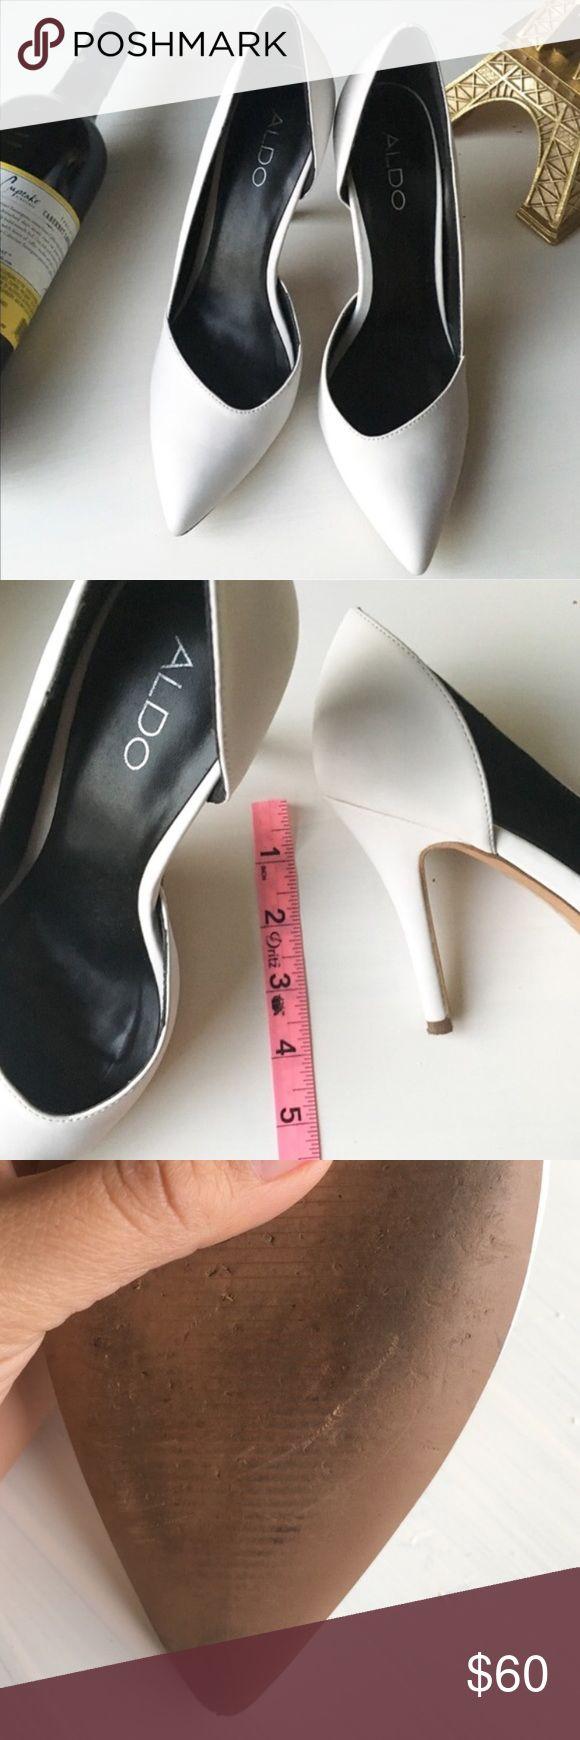 Aldo heels Great conditions 👌🏻 Super elegant 😍 Bundle for discount 💡  Follow my Instagram : @vintage.paris Aldo Shoes Heels